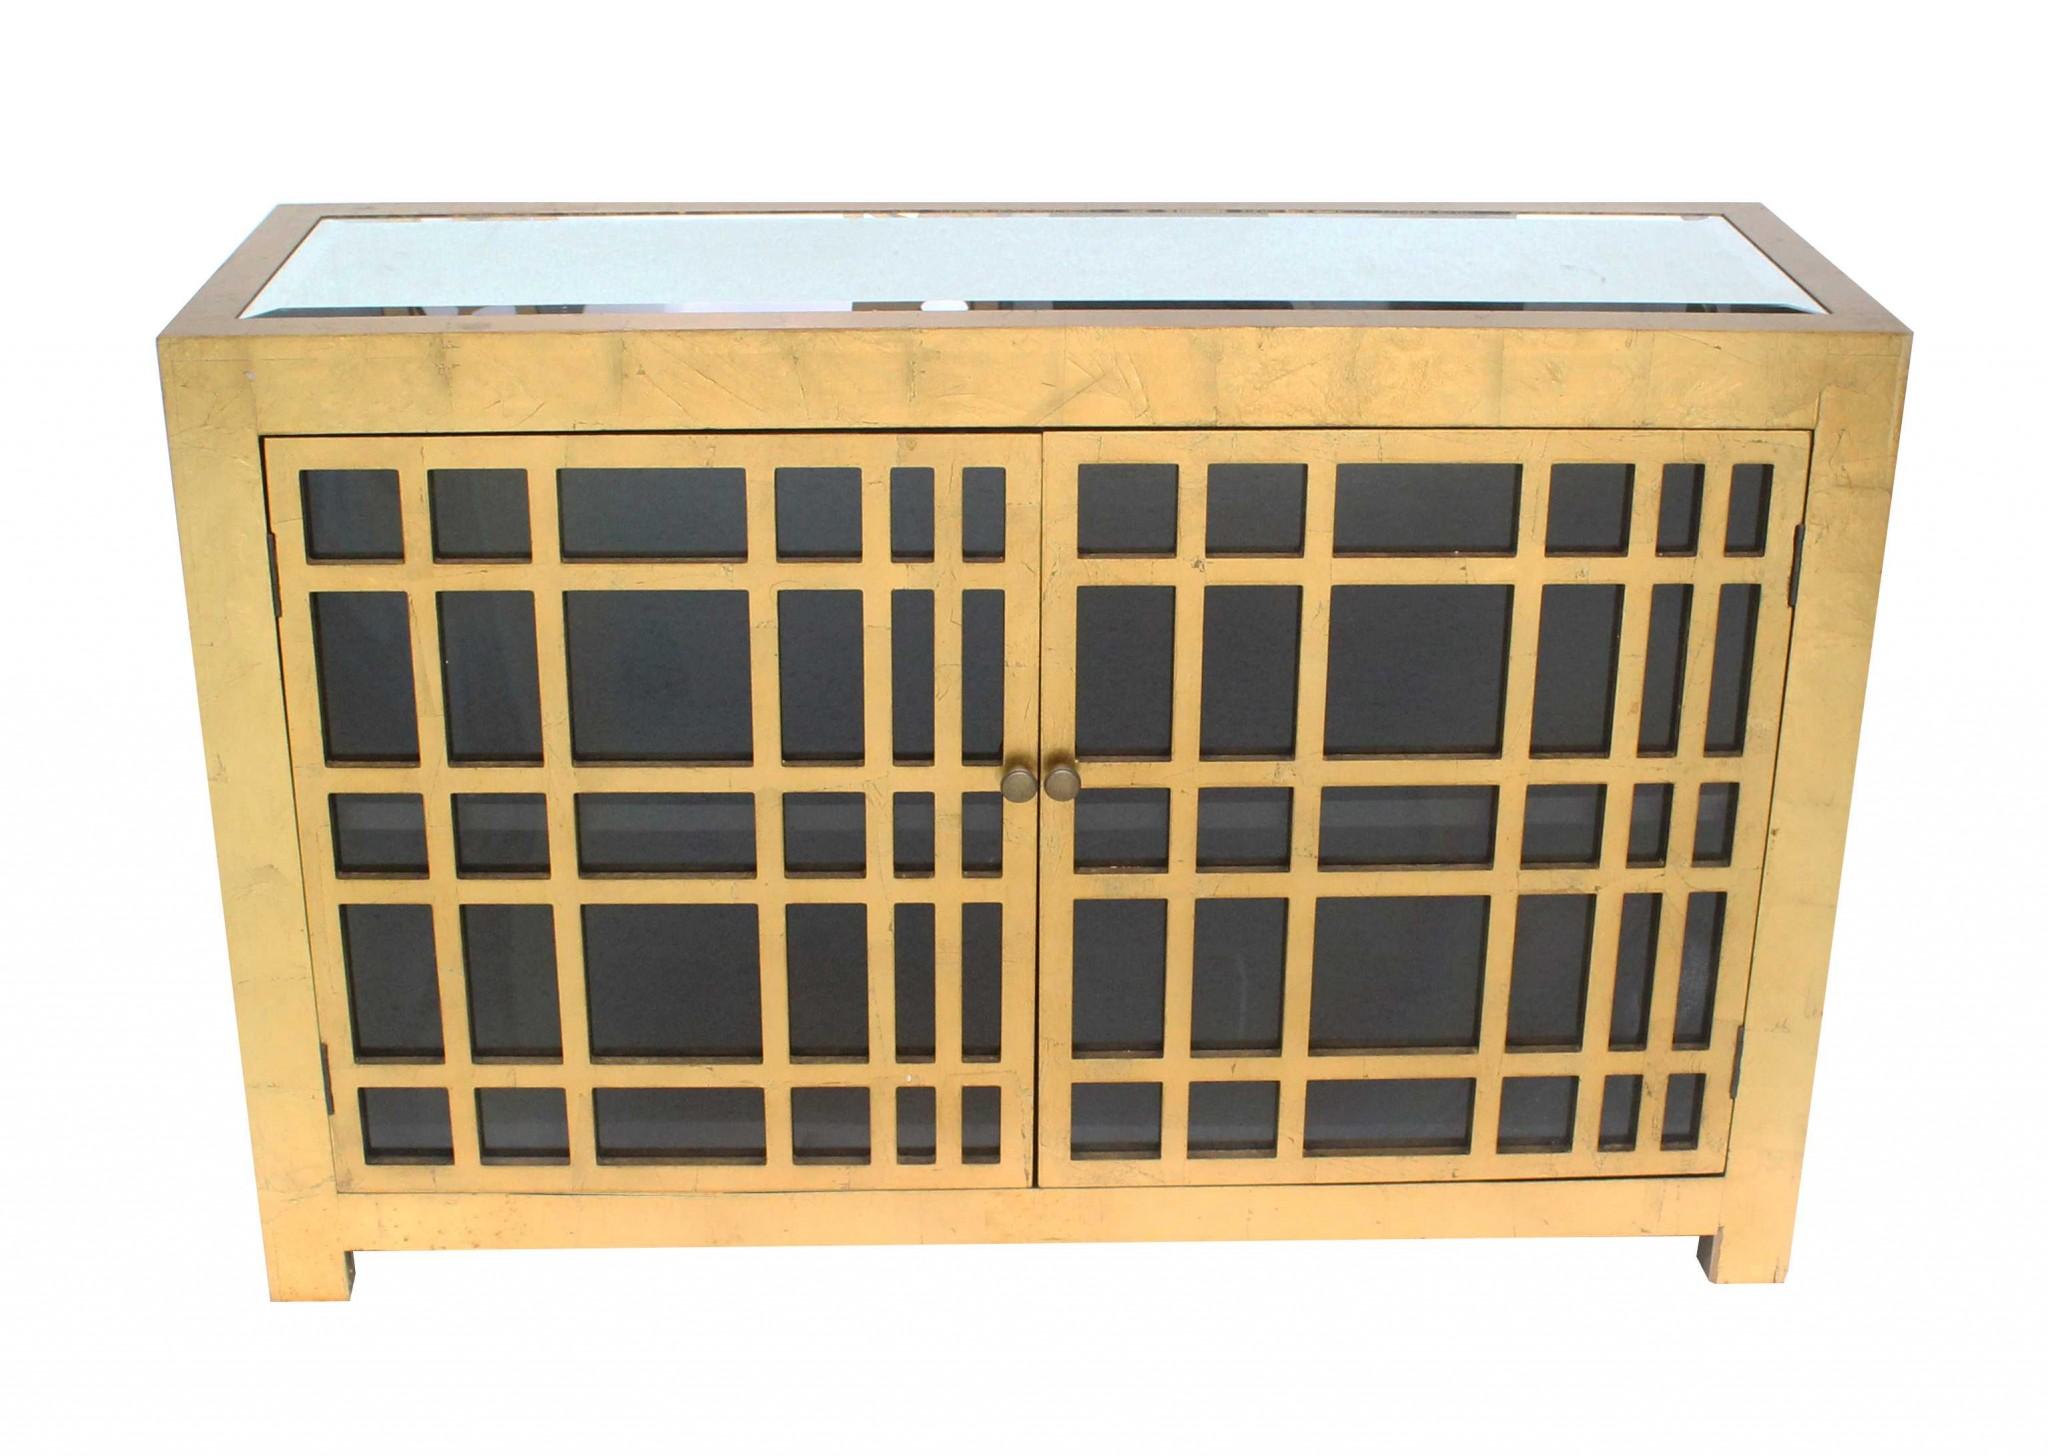 "16"" x 48"" x 32"" Gold, Rustic Lattice, Wood - Cabinet"